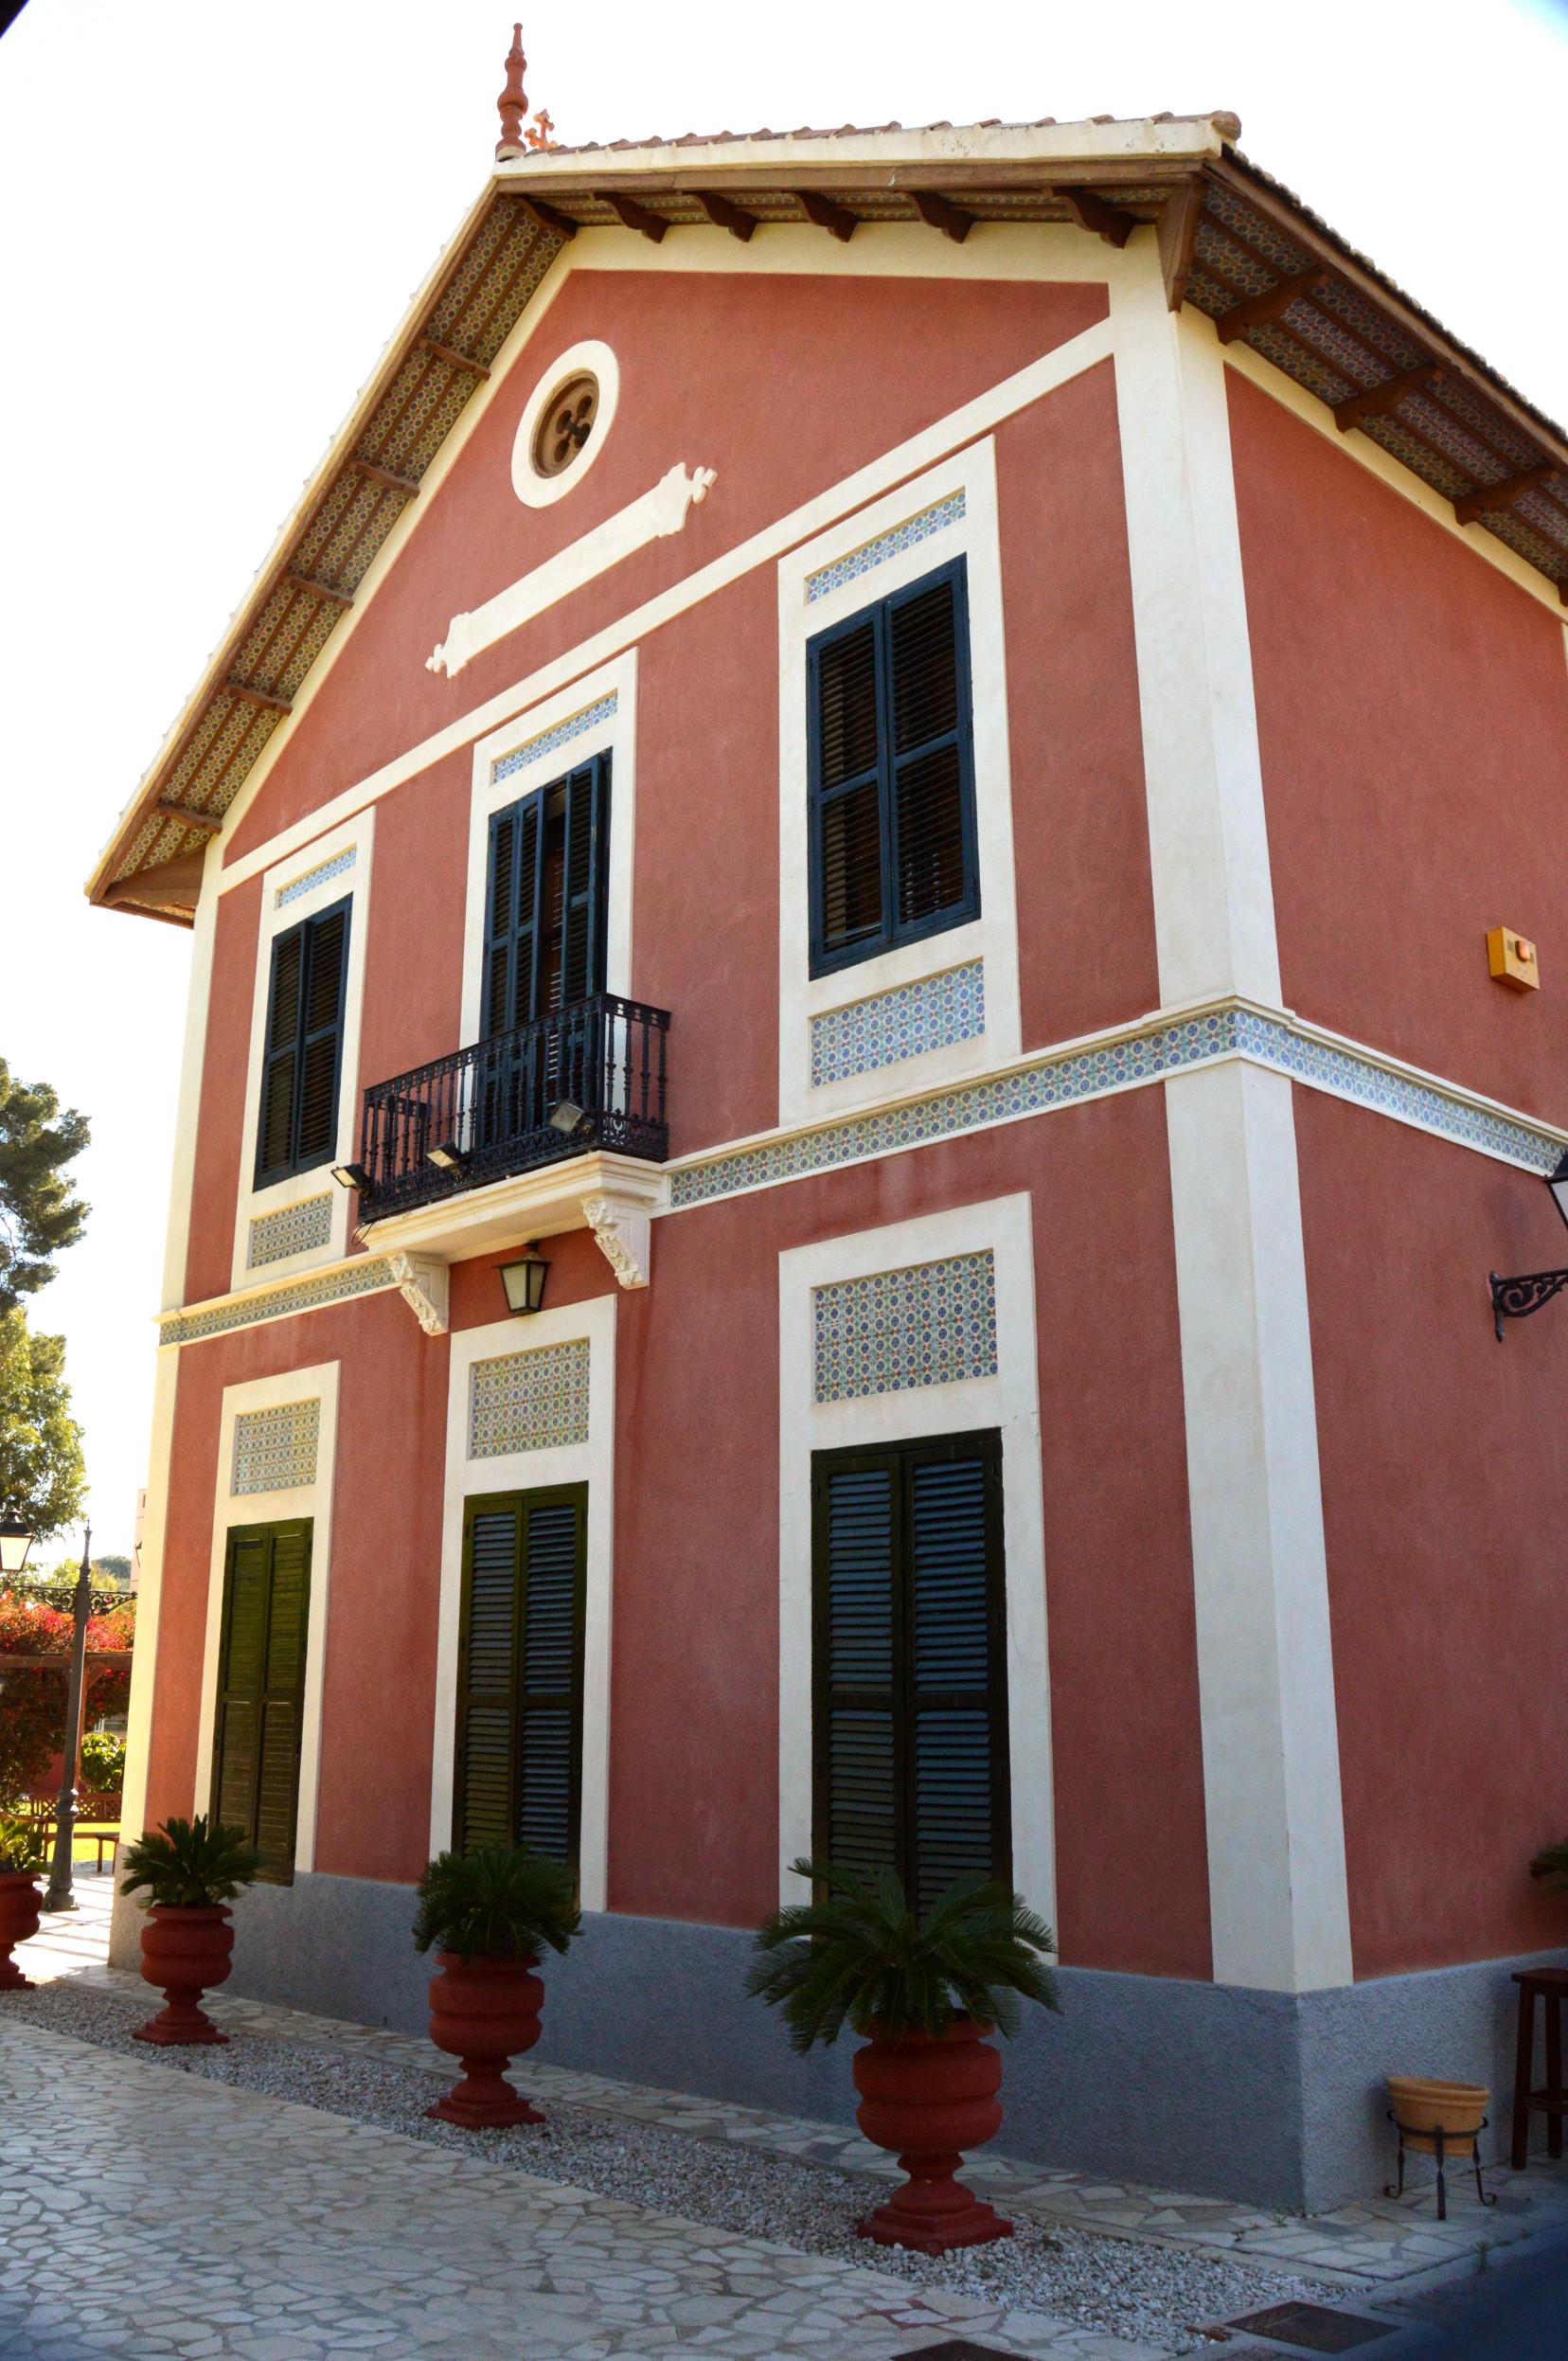 Finca villa antonia turismo sant joan d 39 alacant for Finca villa jardin piedecuesta